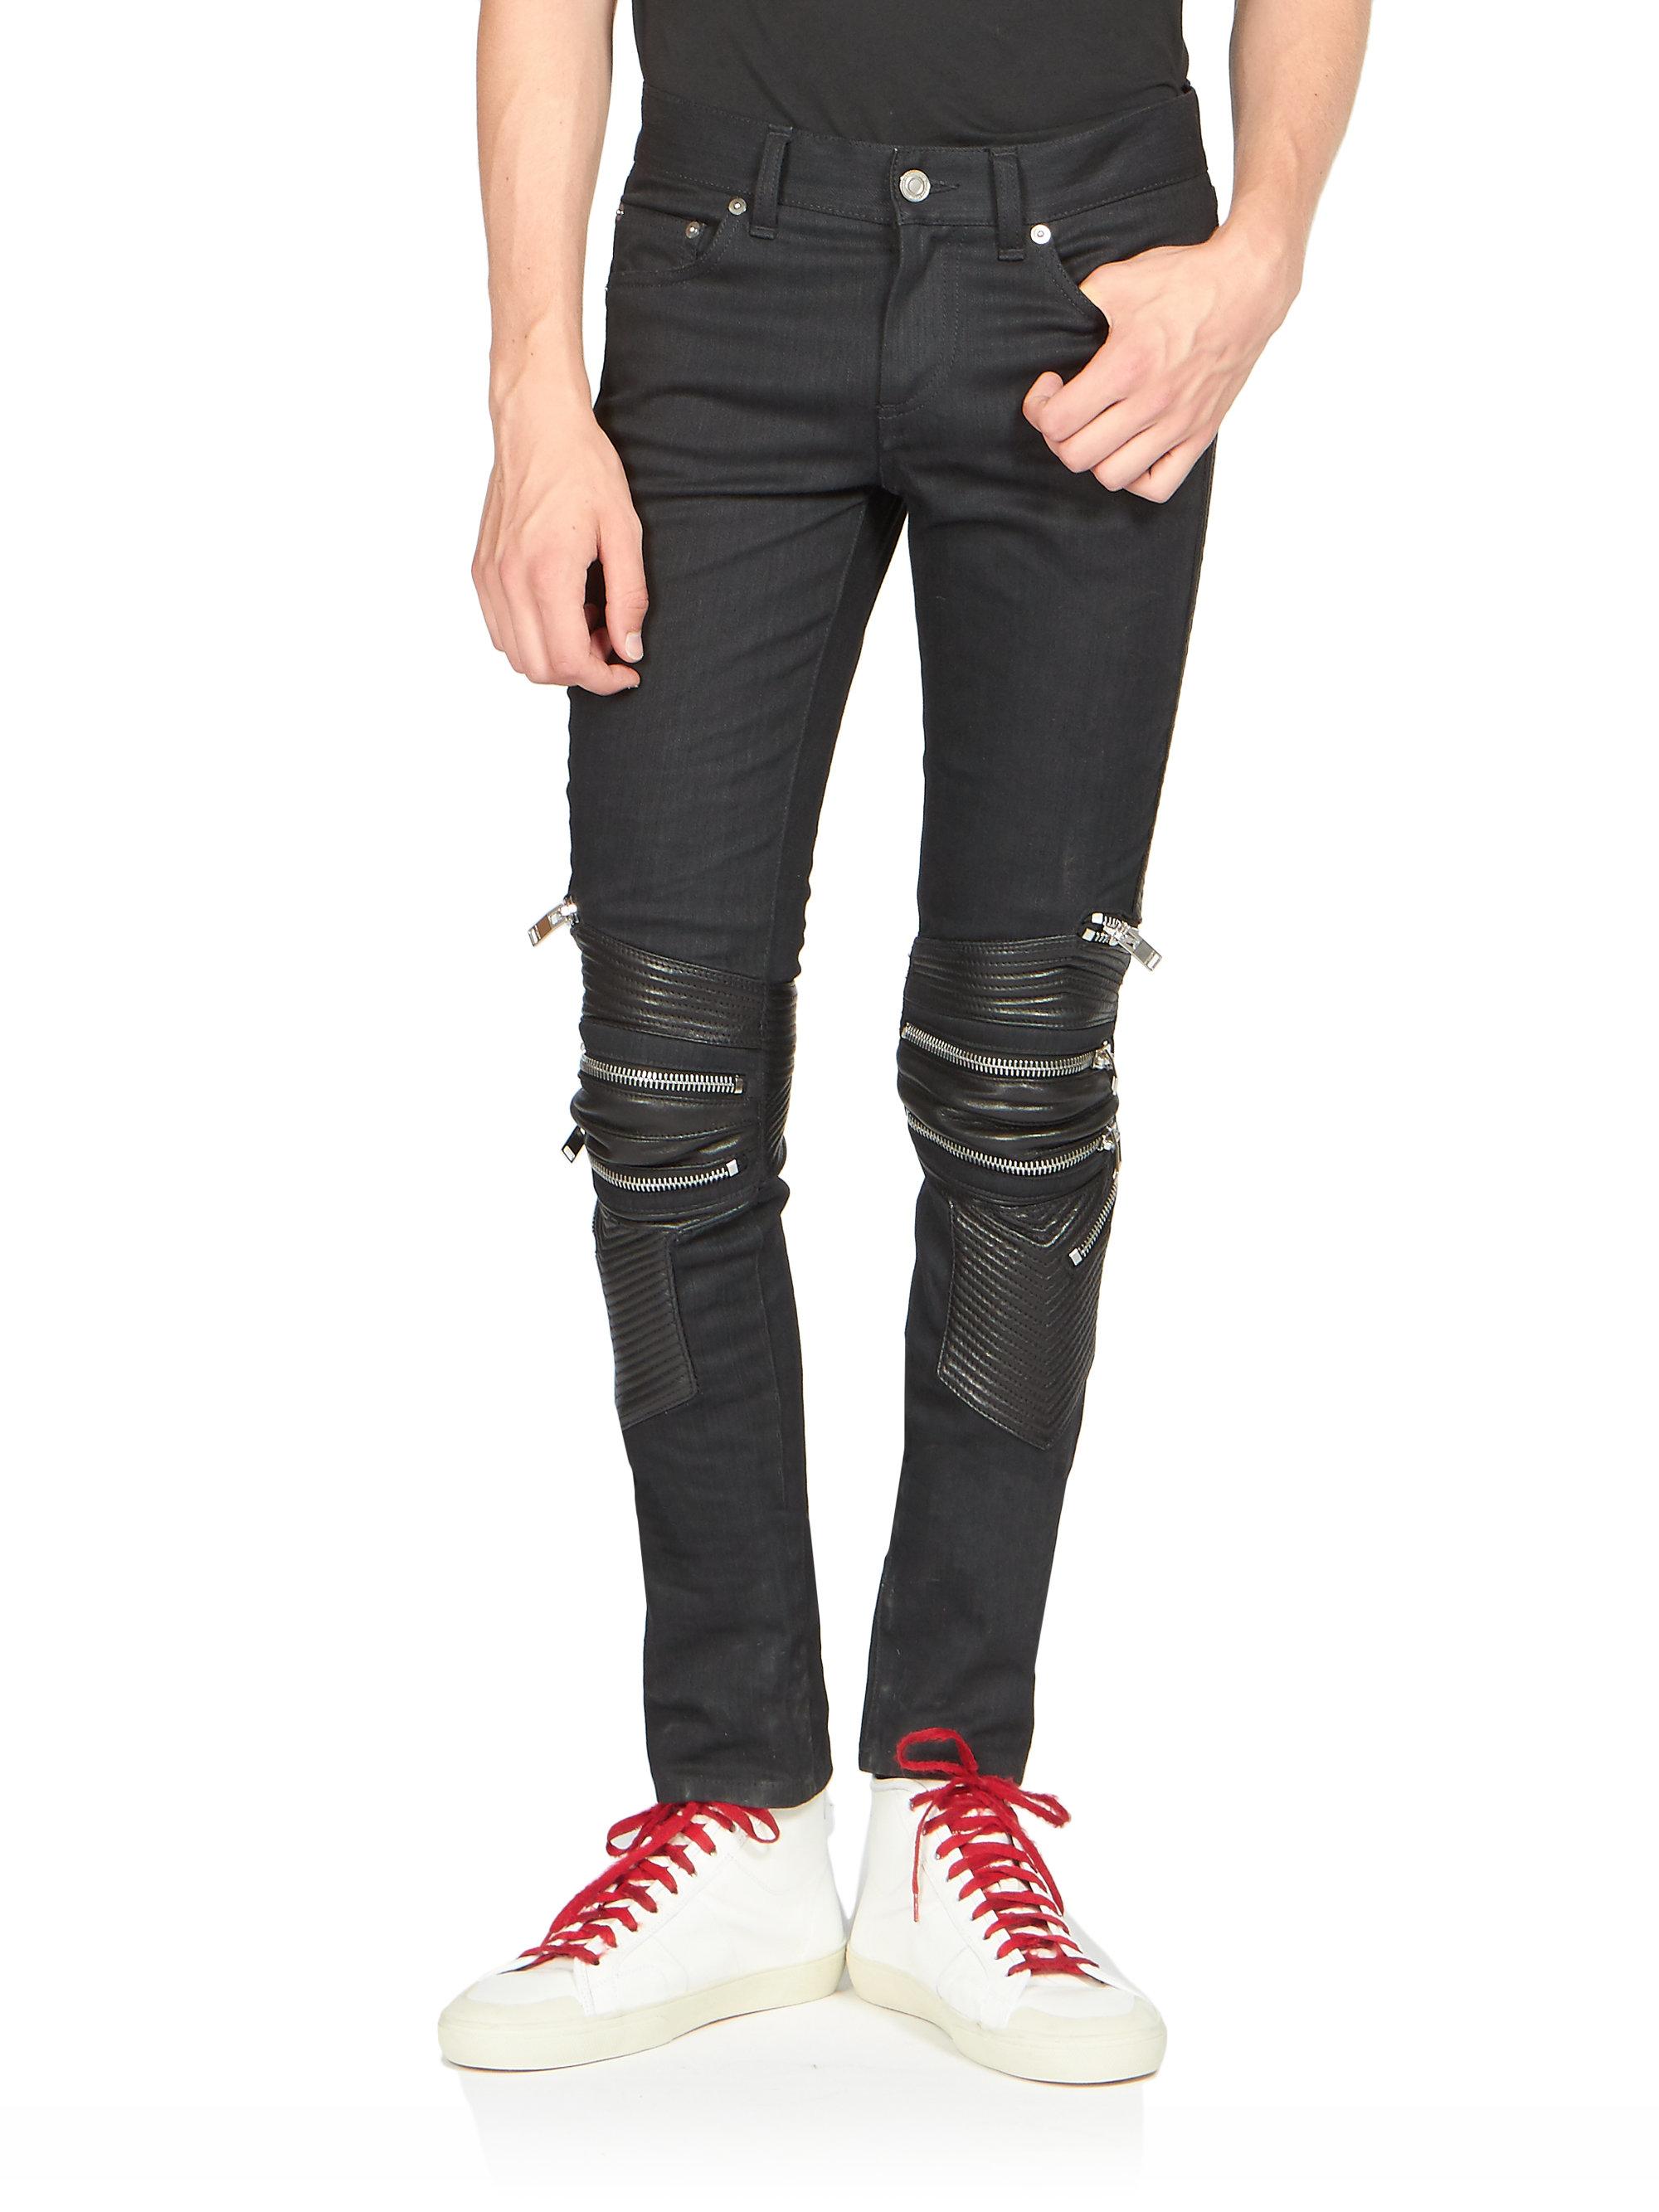 83c19b26f74 Saint Laurent Leather-detail Moto Jeans in Black for Men - Lyst